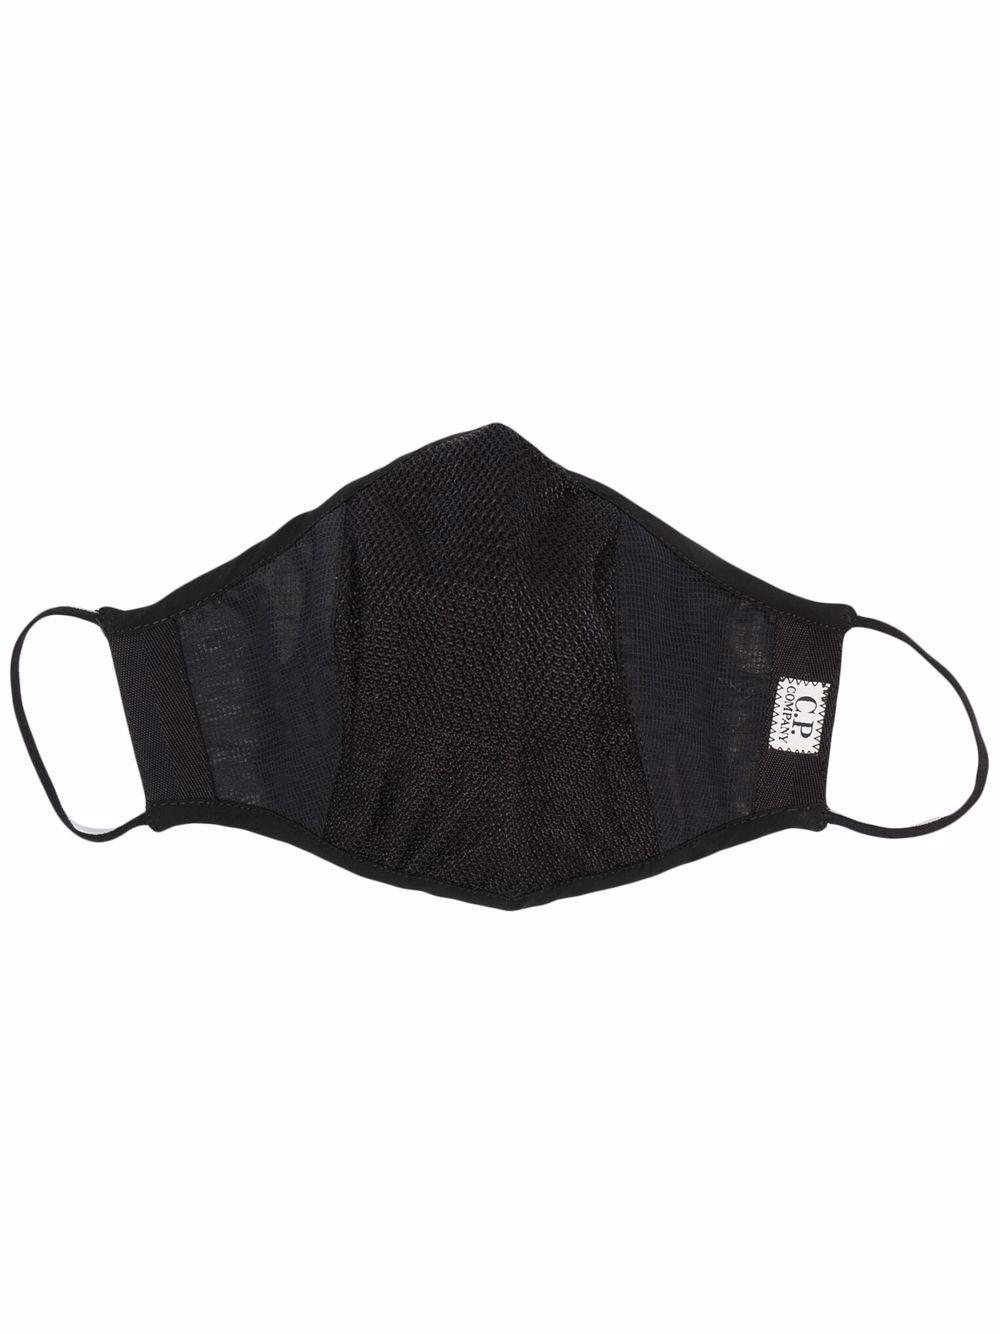 logo mask unisex black C.P. COMPANY | Face Mask | 11CMAC303A005862M999